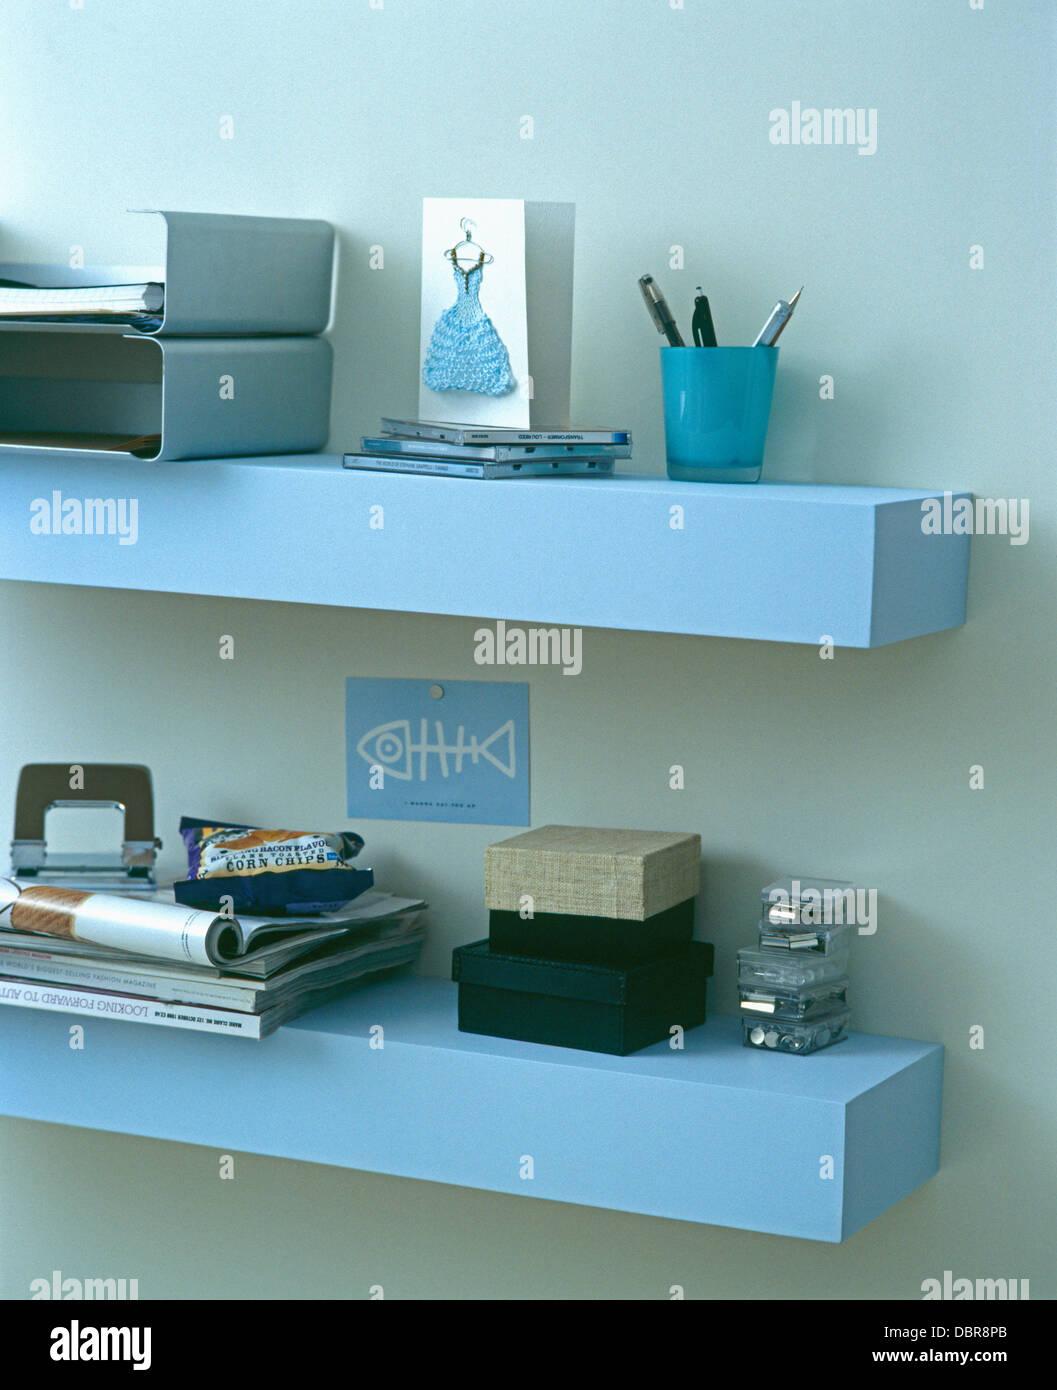 ikea lack wall shelf instructions